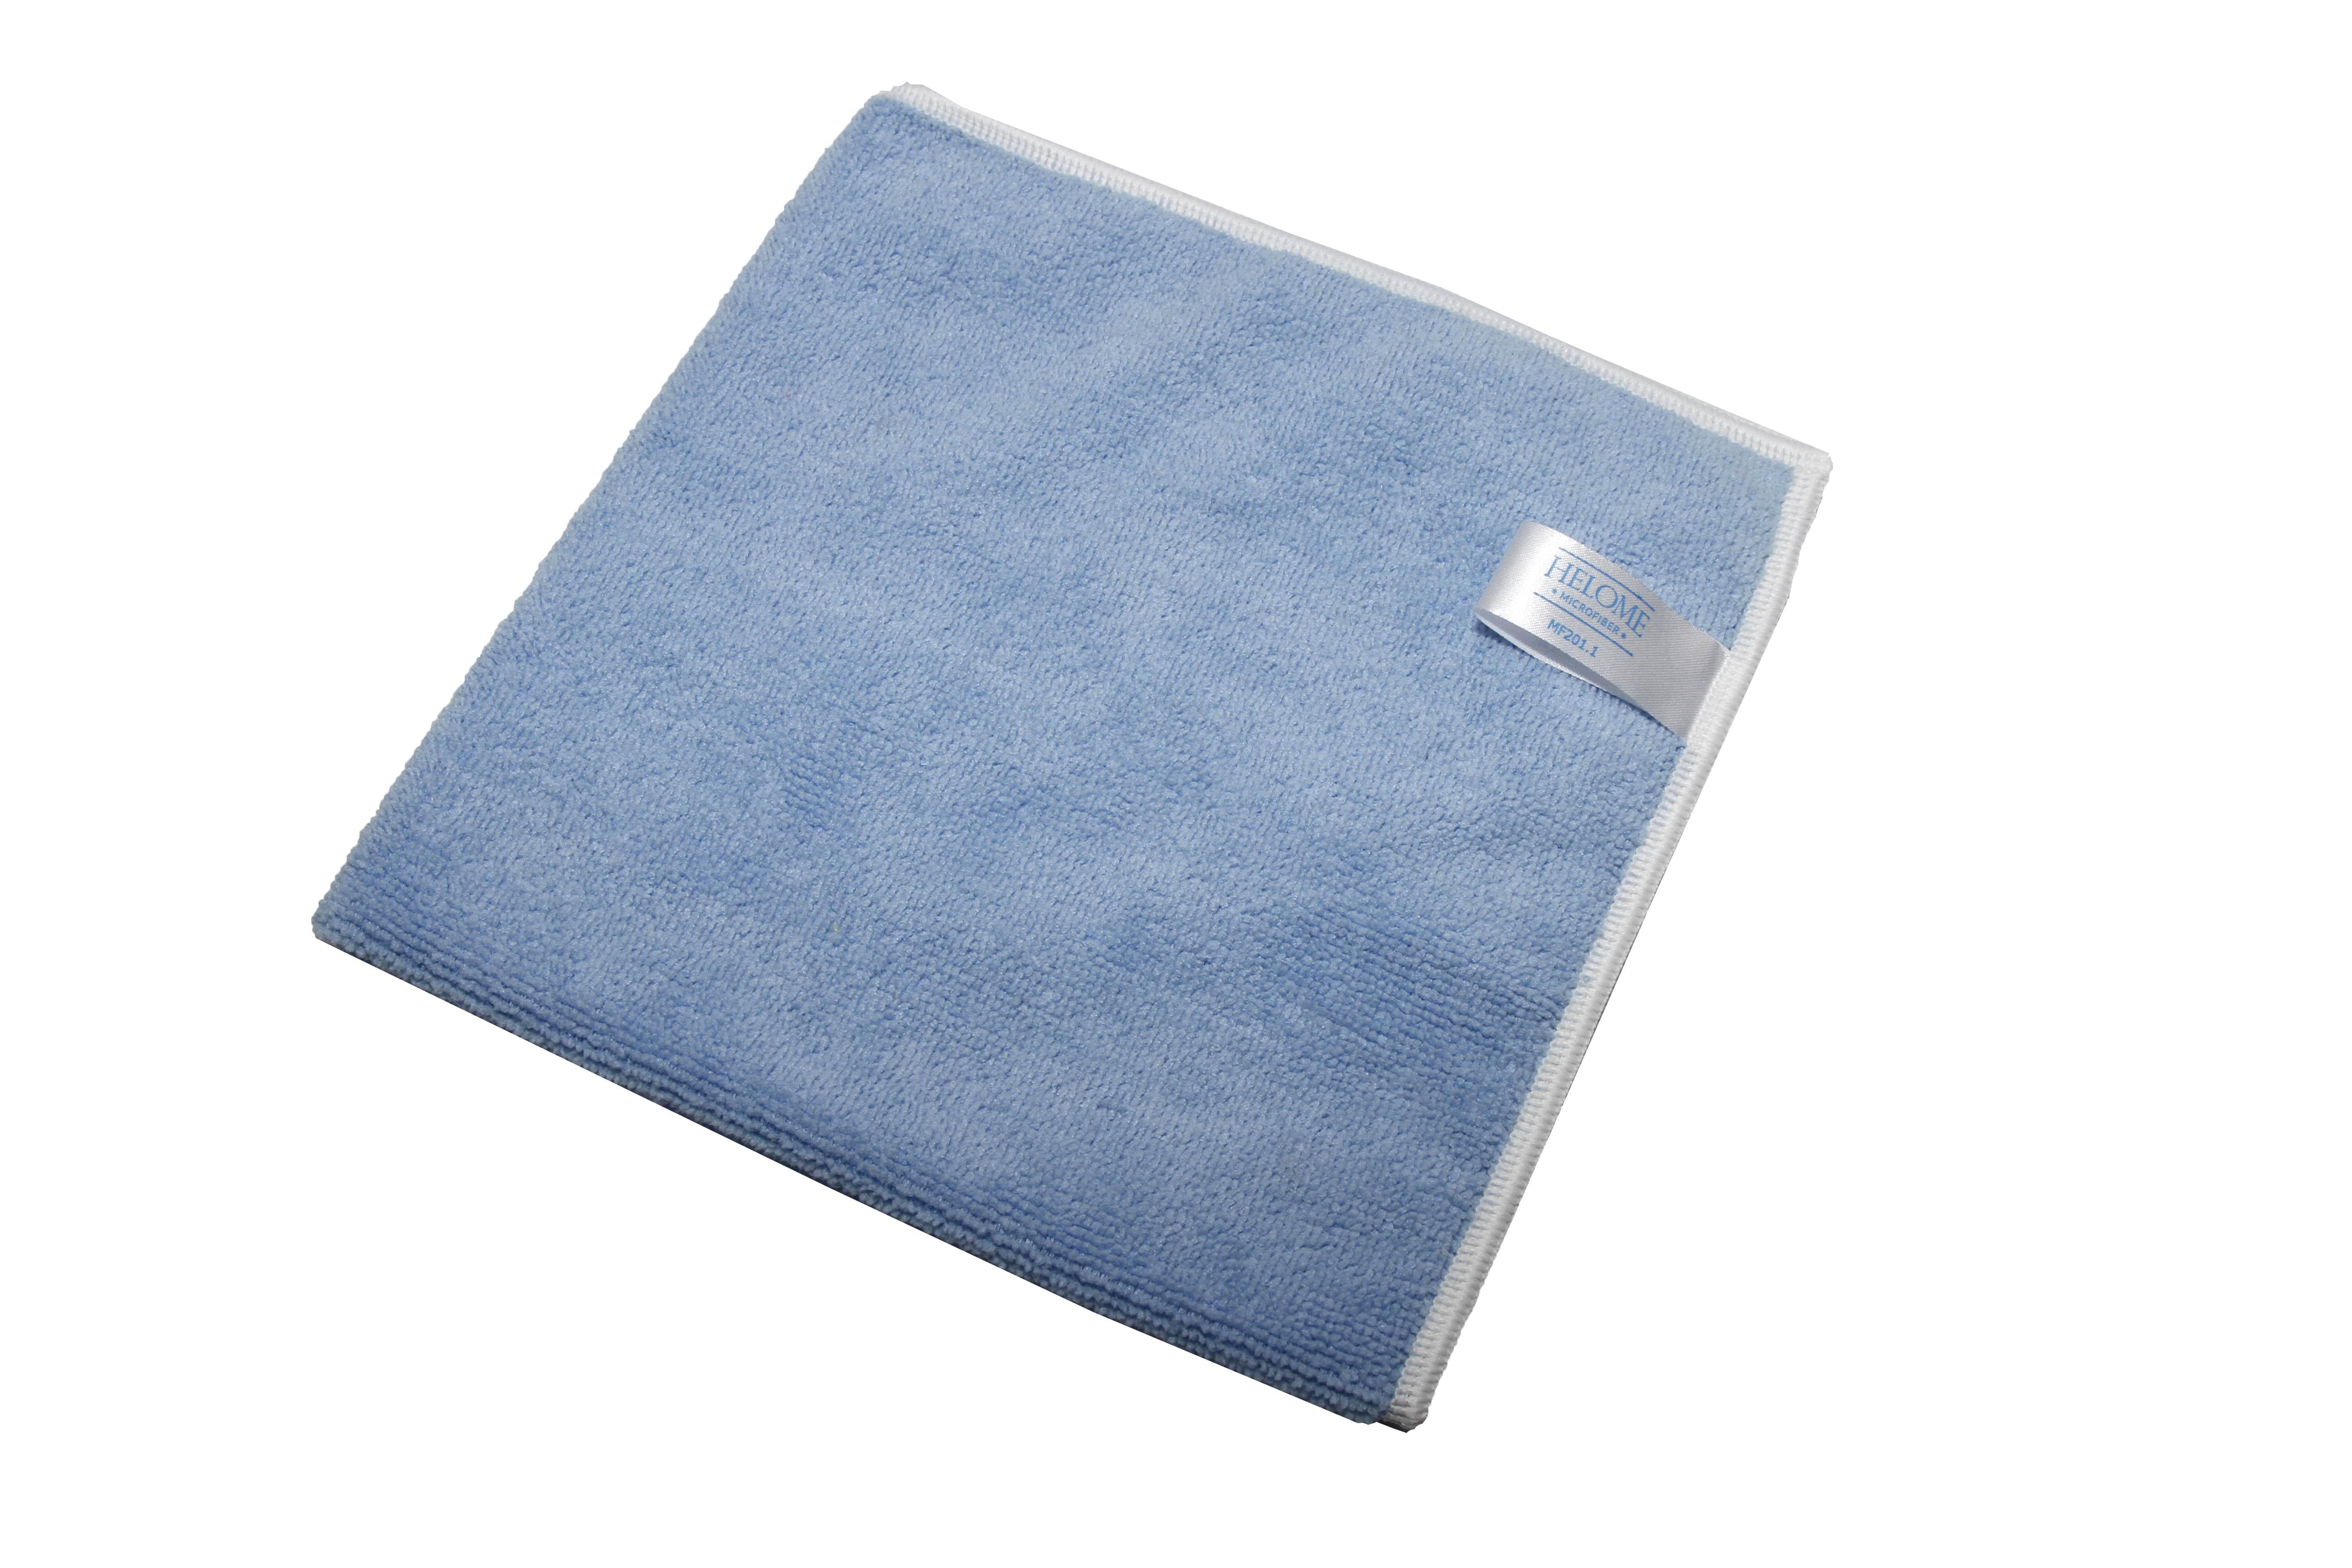 "Microfaser-Allzwecktuch""PRO""40x40cm blau, 1 Stk."